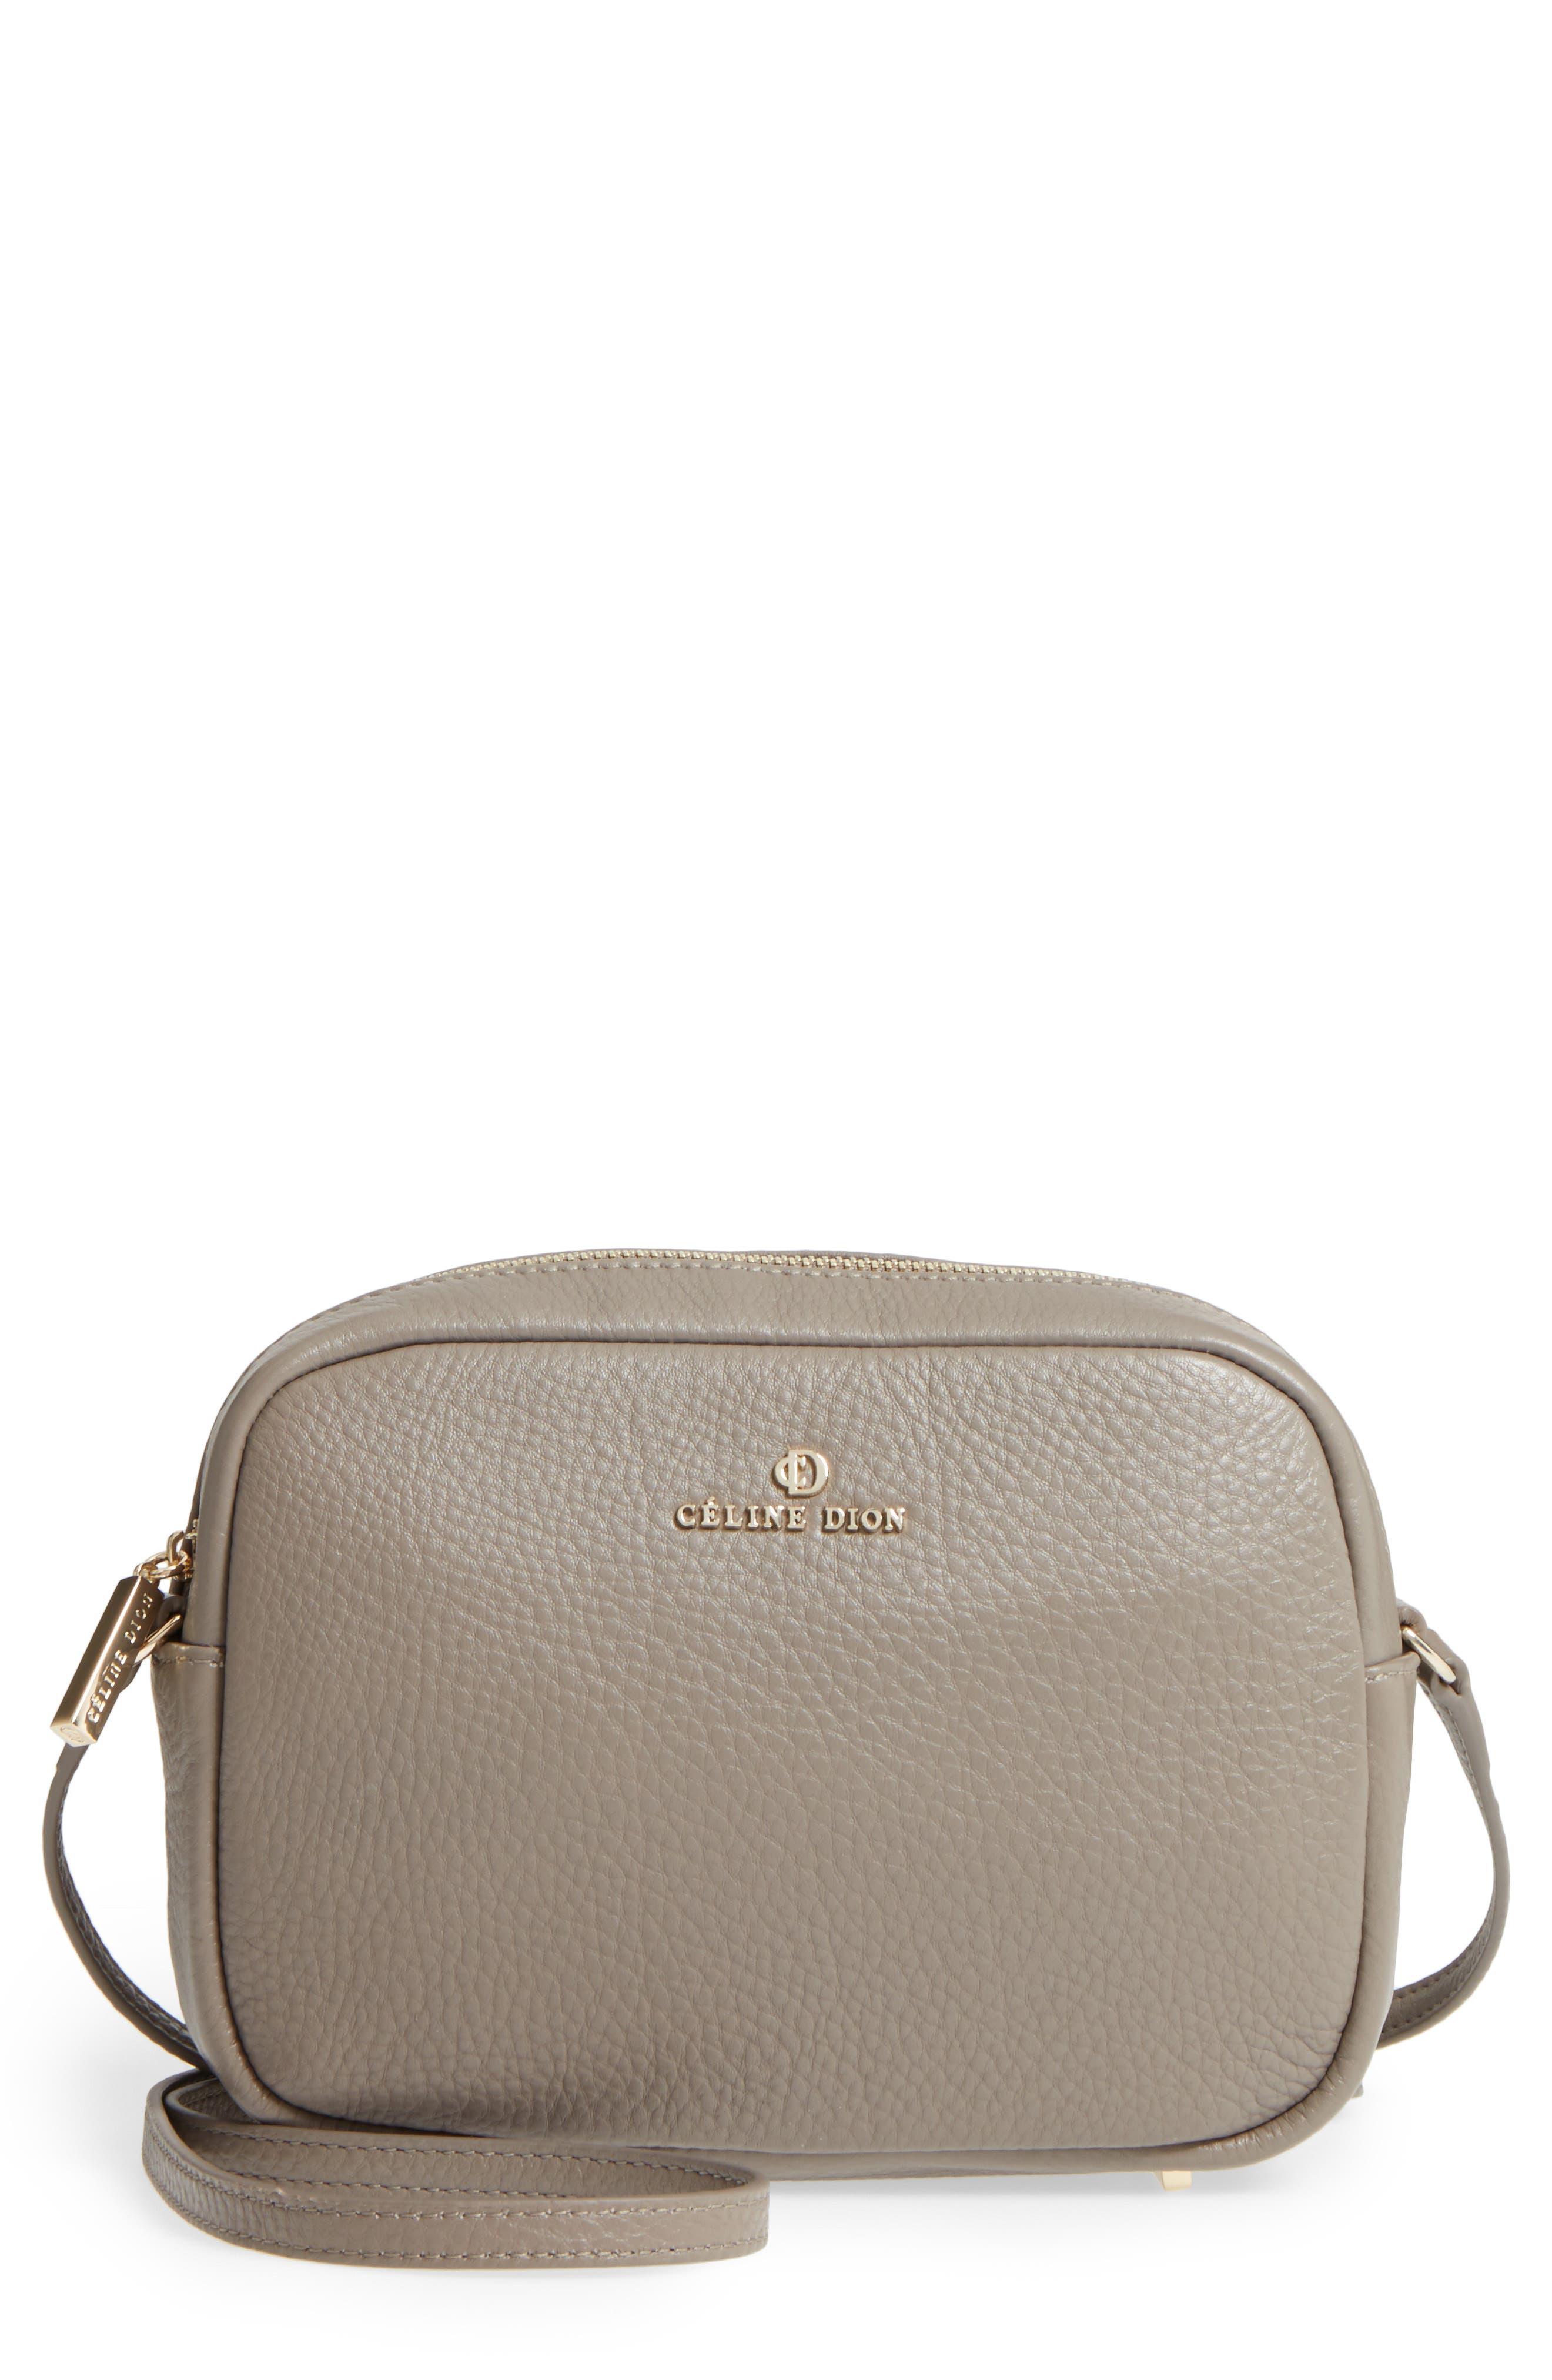 Céline Dion Adagio Leather Camera Crossbody Bag,                             Main thumbnail 3, color,